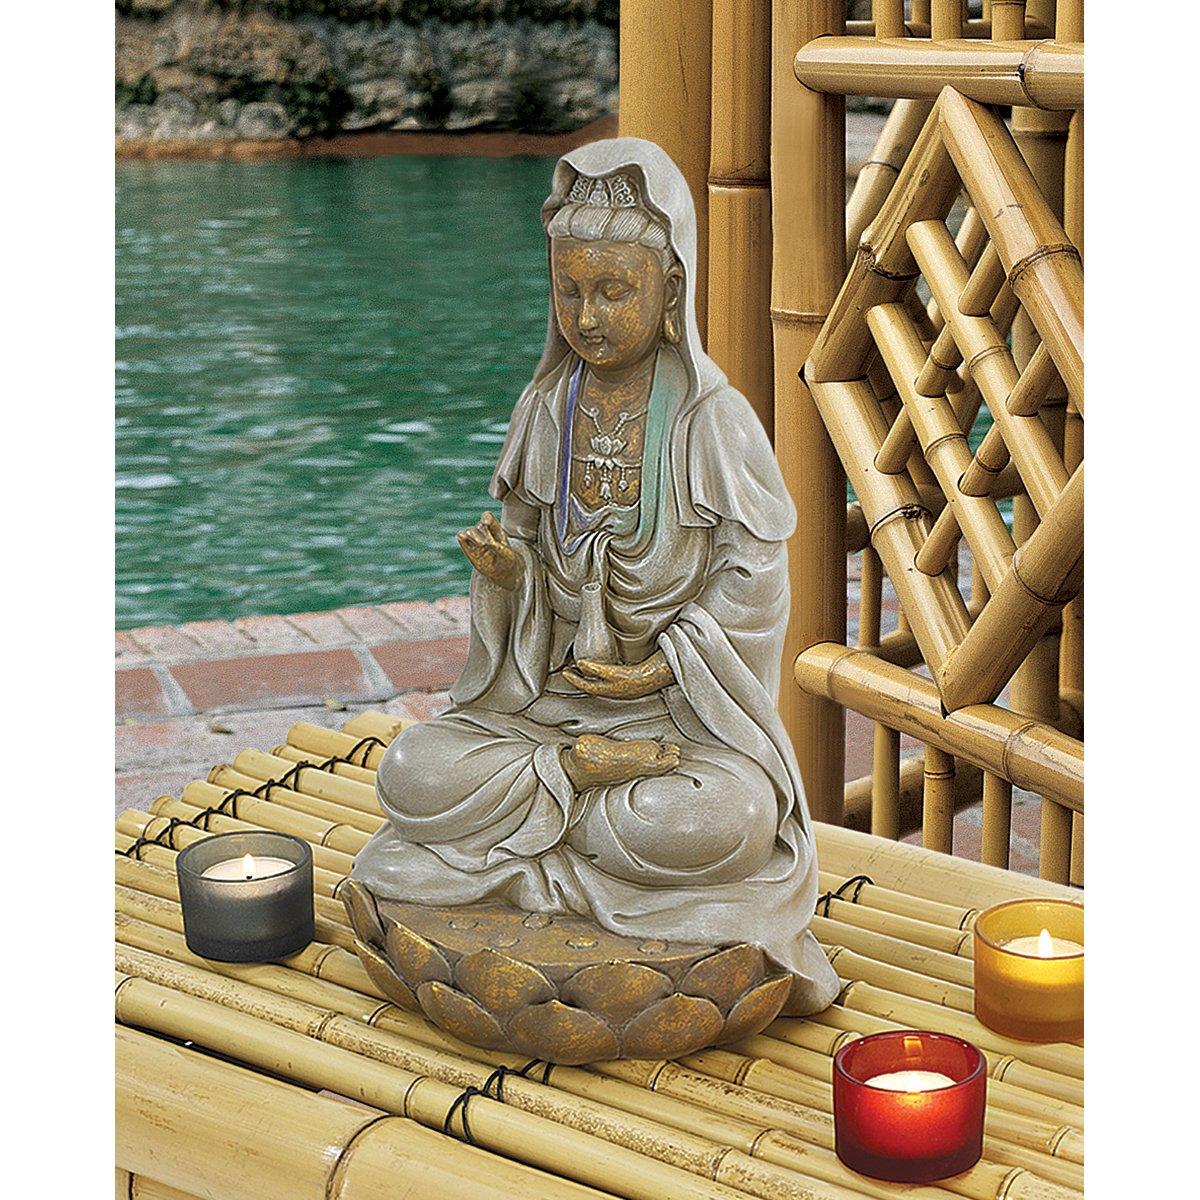 Amazon.com : Design Toscano Goddess Guan Yin Seated On A Lotus Statue :  Guanyin Statue : Garden U0026 Outdoor